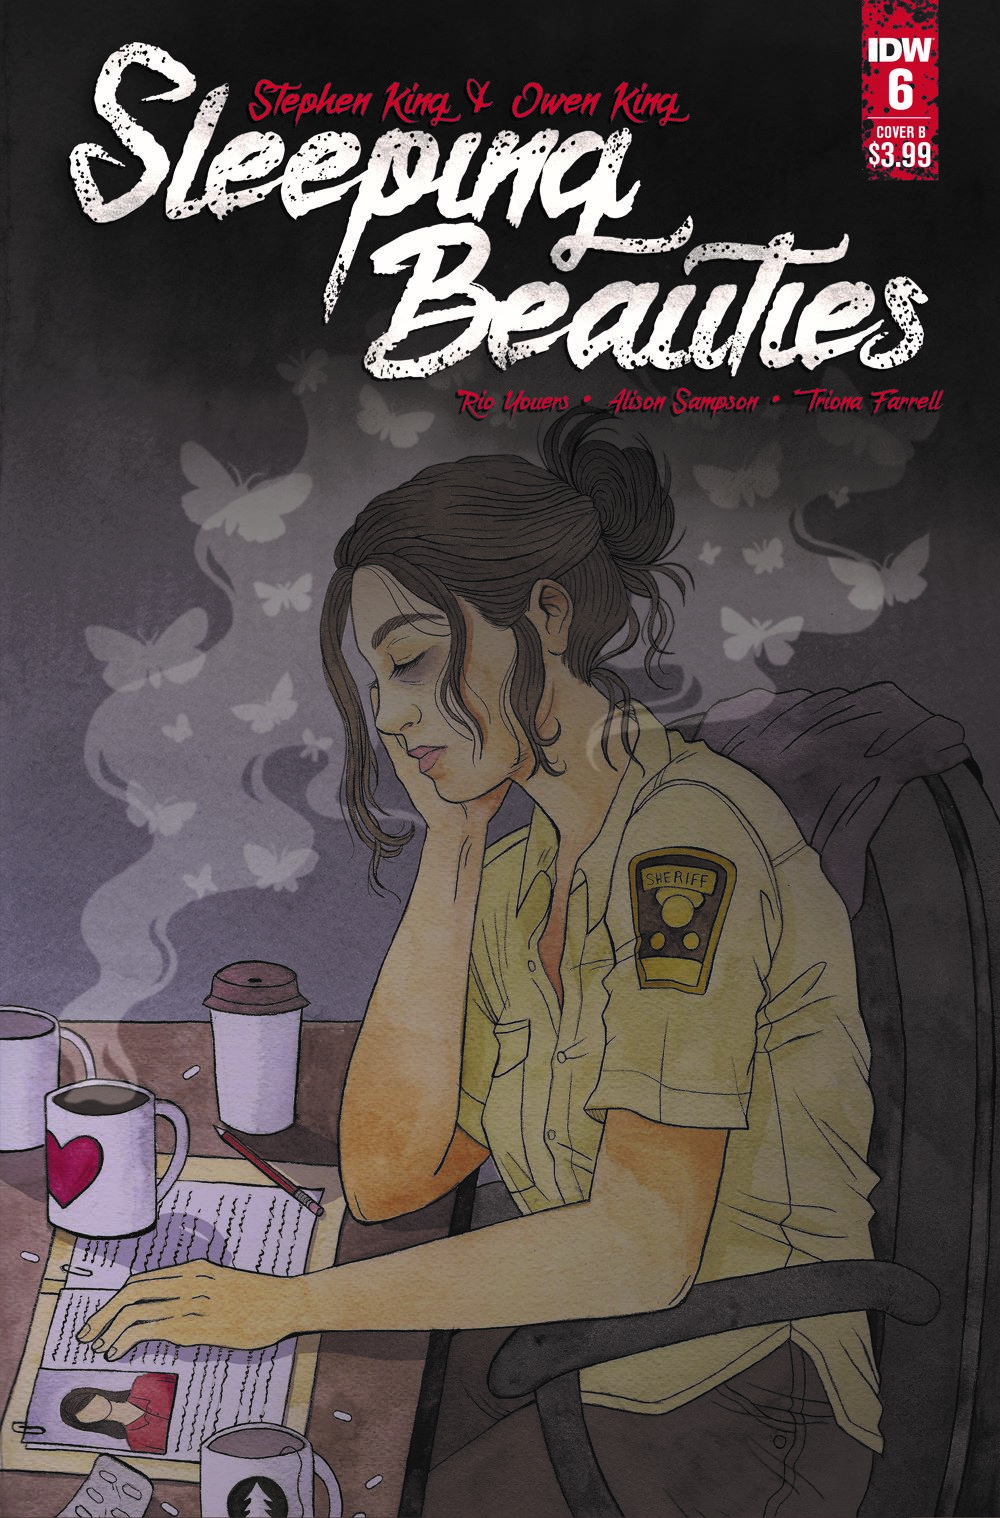 SleepingBeauties_06_CVR_B-2 ComicList: IDW Publishing New Releases for 05/19/2021